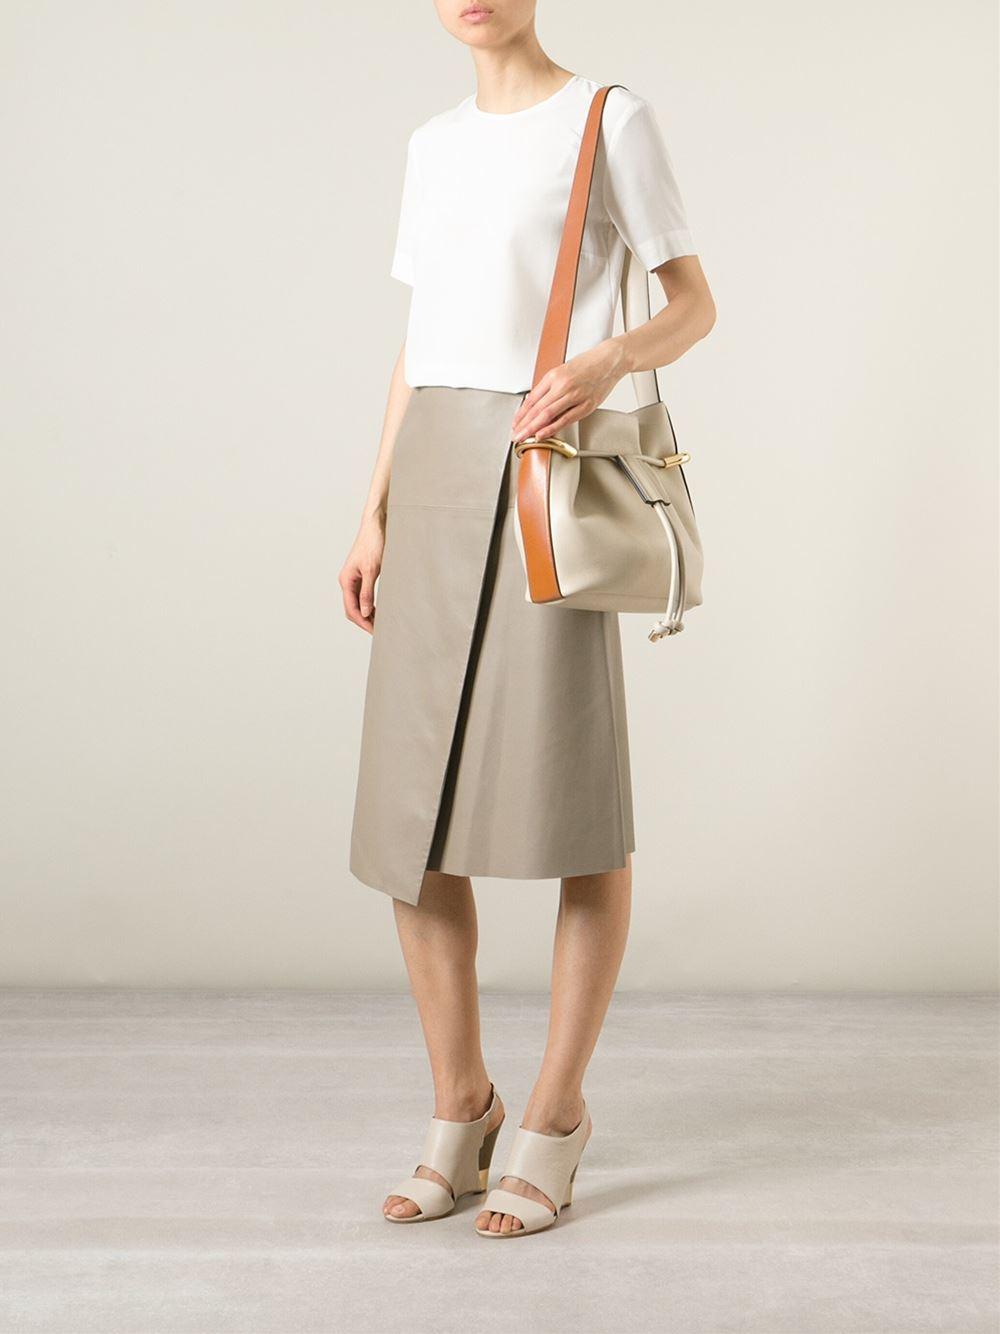 Chlo�� Emma Leather Shoulder Bag in Beige (nude \u0026amp; neutrals)   Lyst